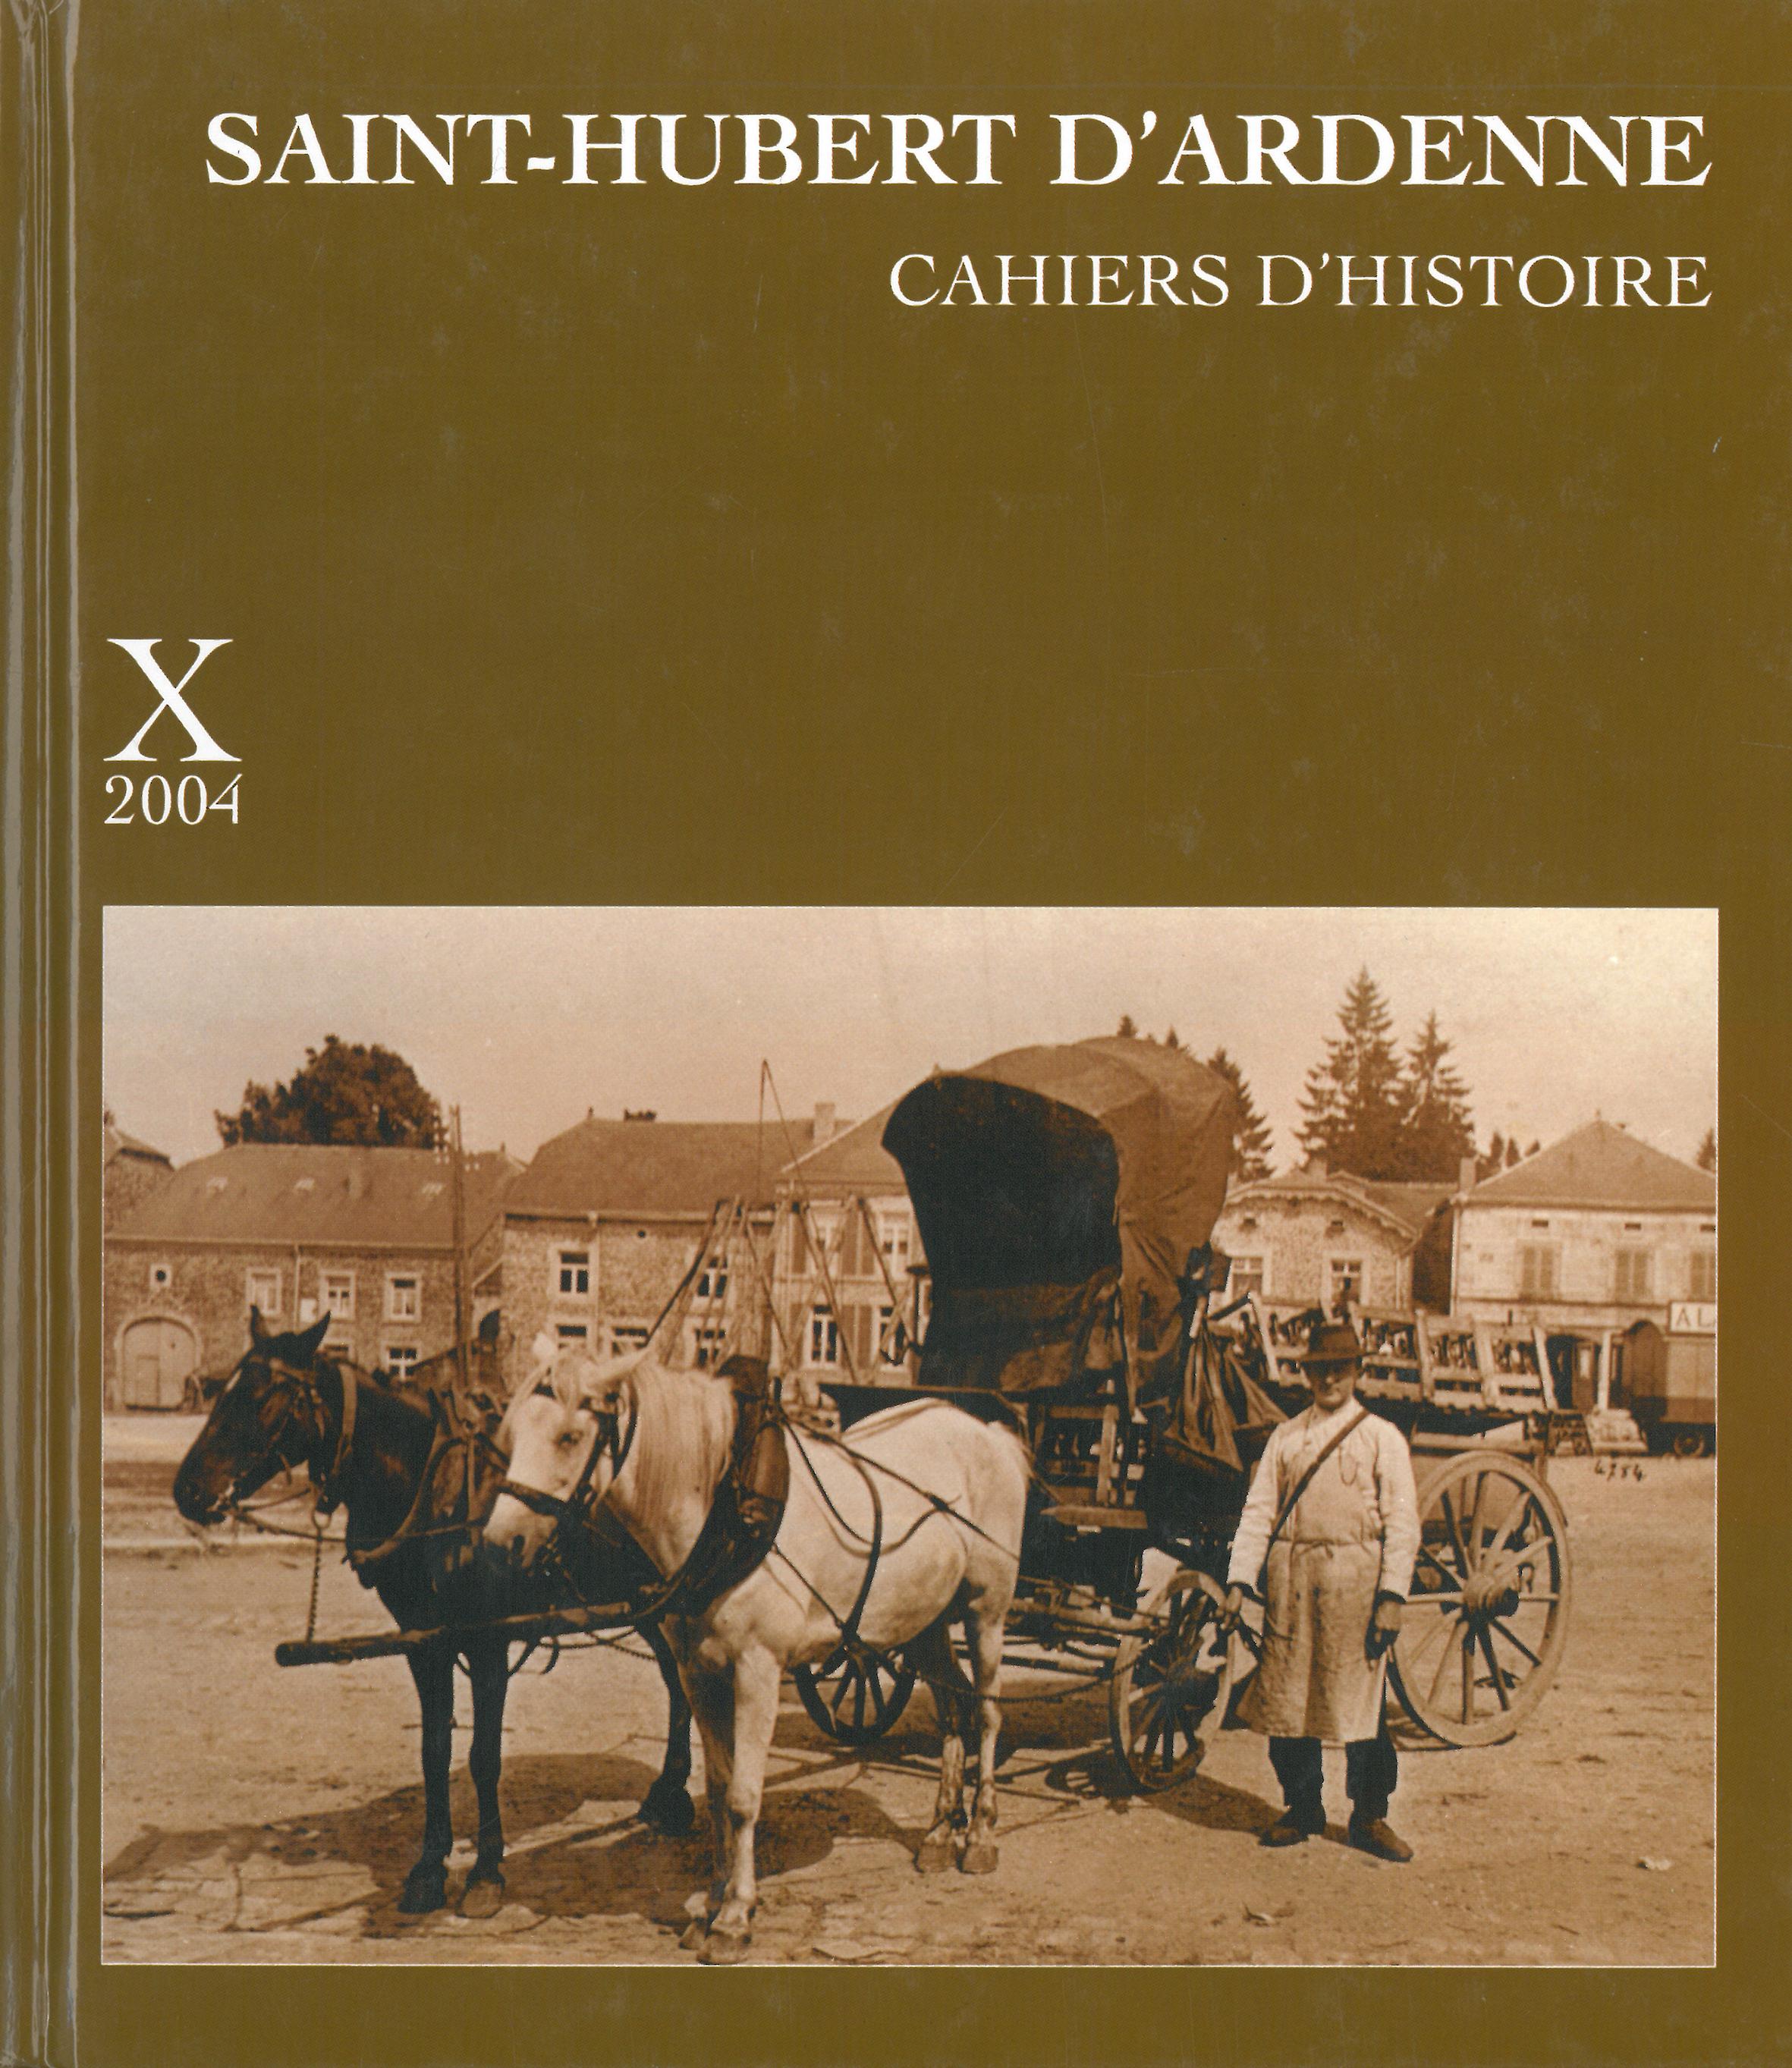 Saint-Hubert d'Ardenne – Cahiers d'histoire X 2004